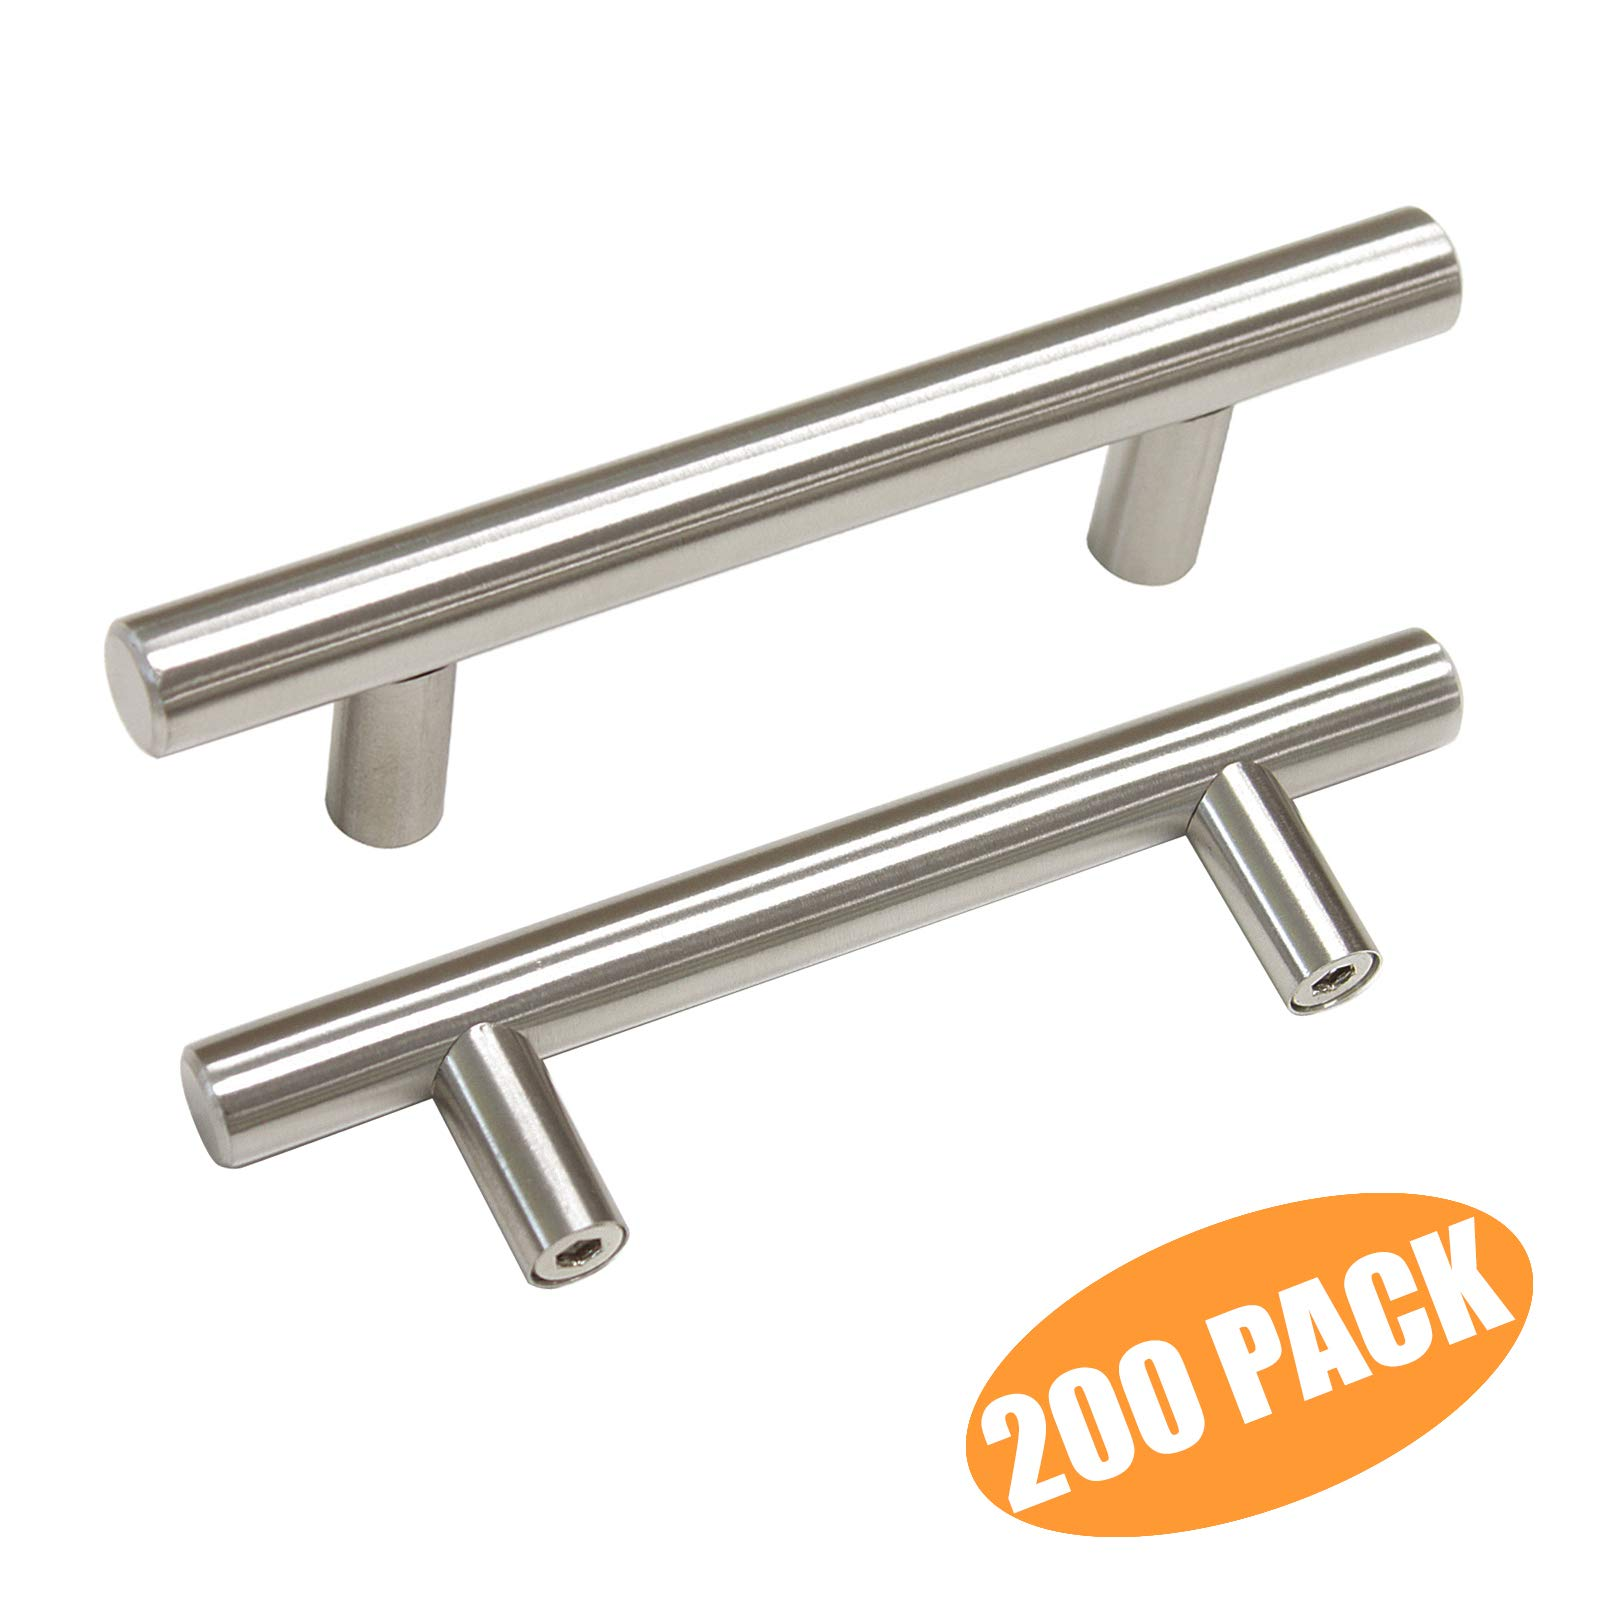 Probrico 3'' Hole Centers Euro T Bar Cabinet Pulls Satin Nickel Kitchen Cabinet Hardware Stainless Steel Bathroom Bedroom Dresser Drawer Knobs Handles(200 Pack)